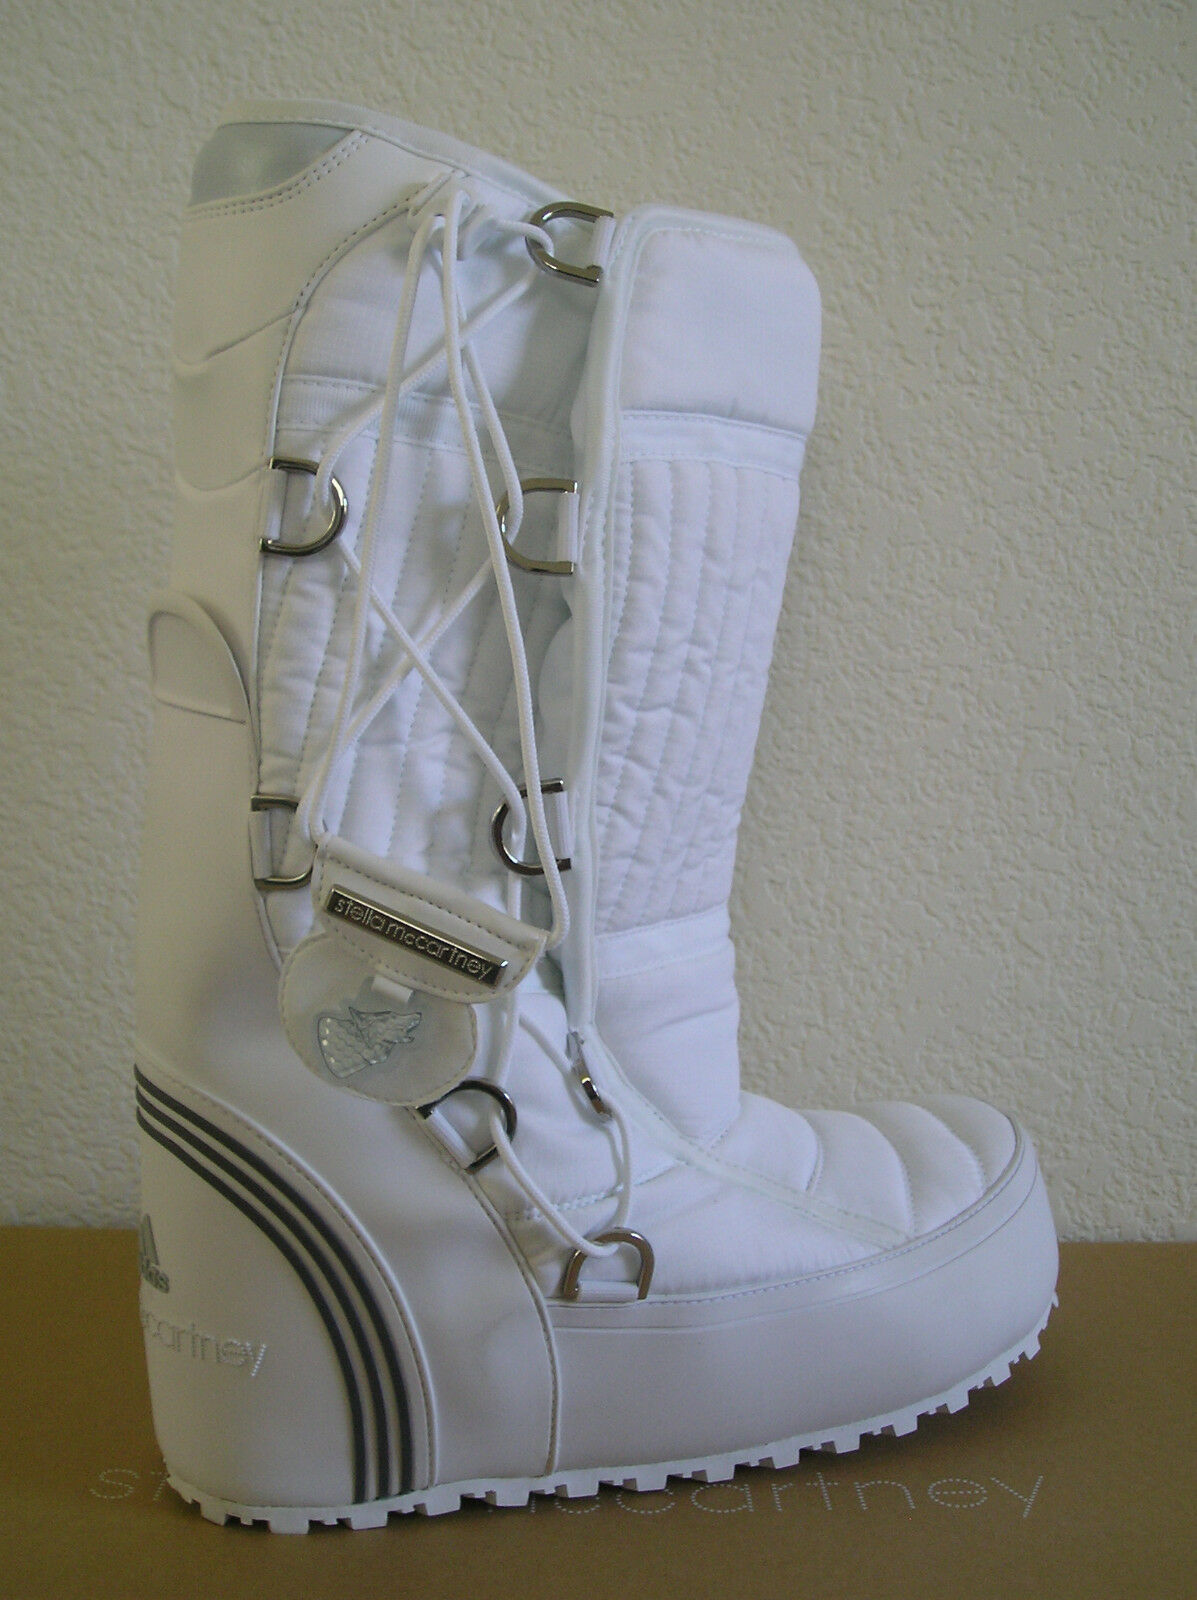 RARE~STELLA McCARTNEY adidas TAHSES WINTER BOOT snow Shoe REMOVABLE LINER~Sz 5.5